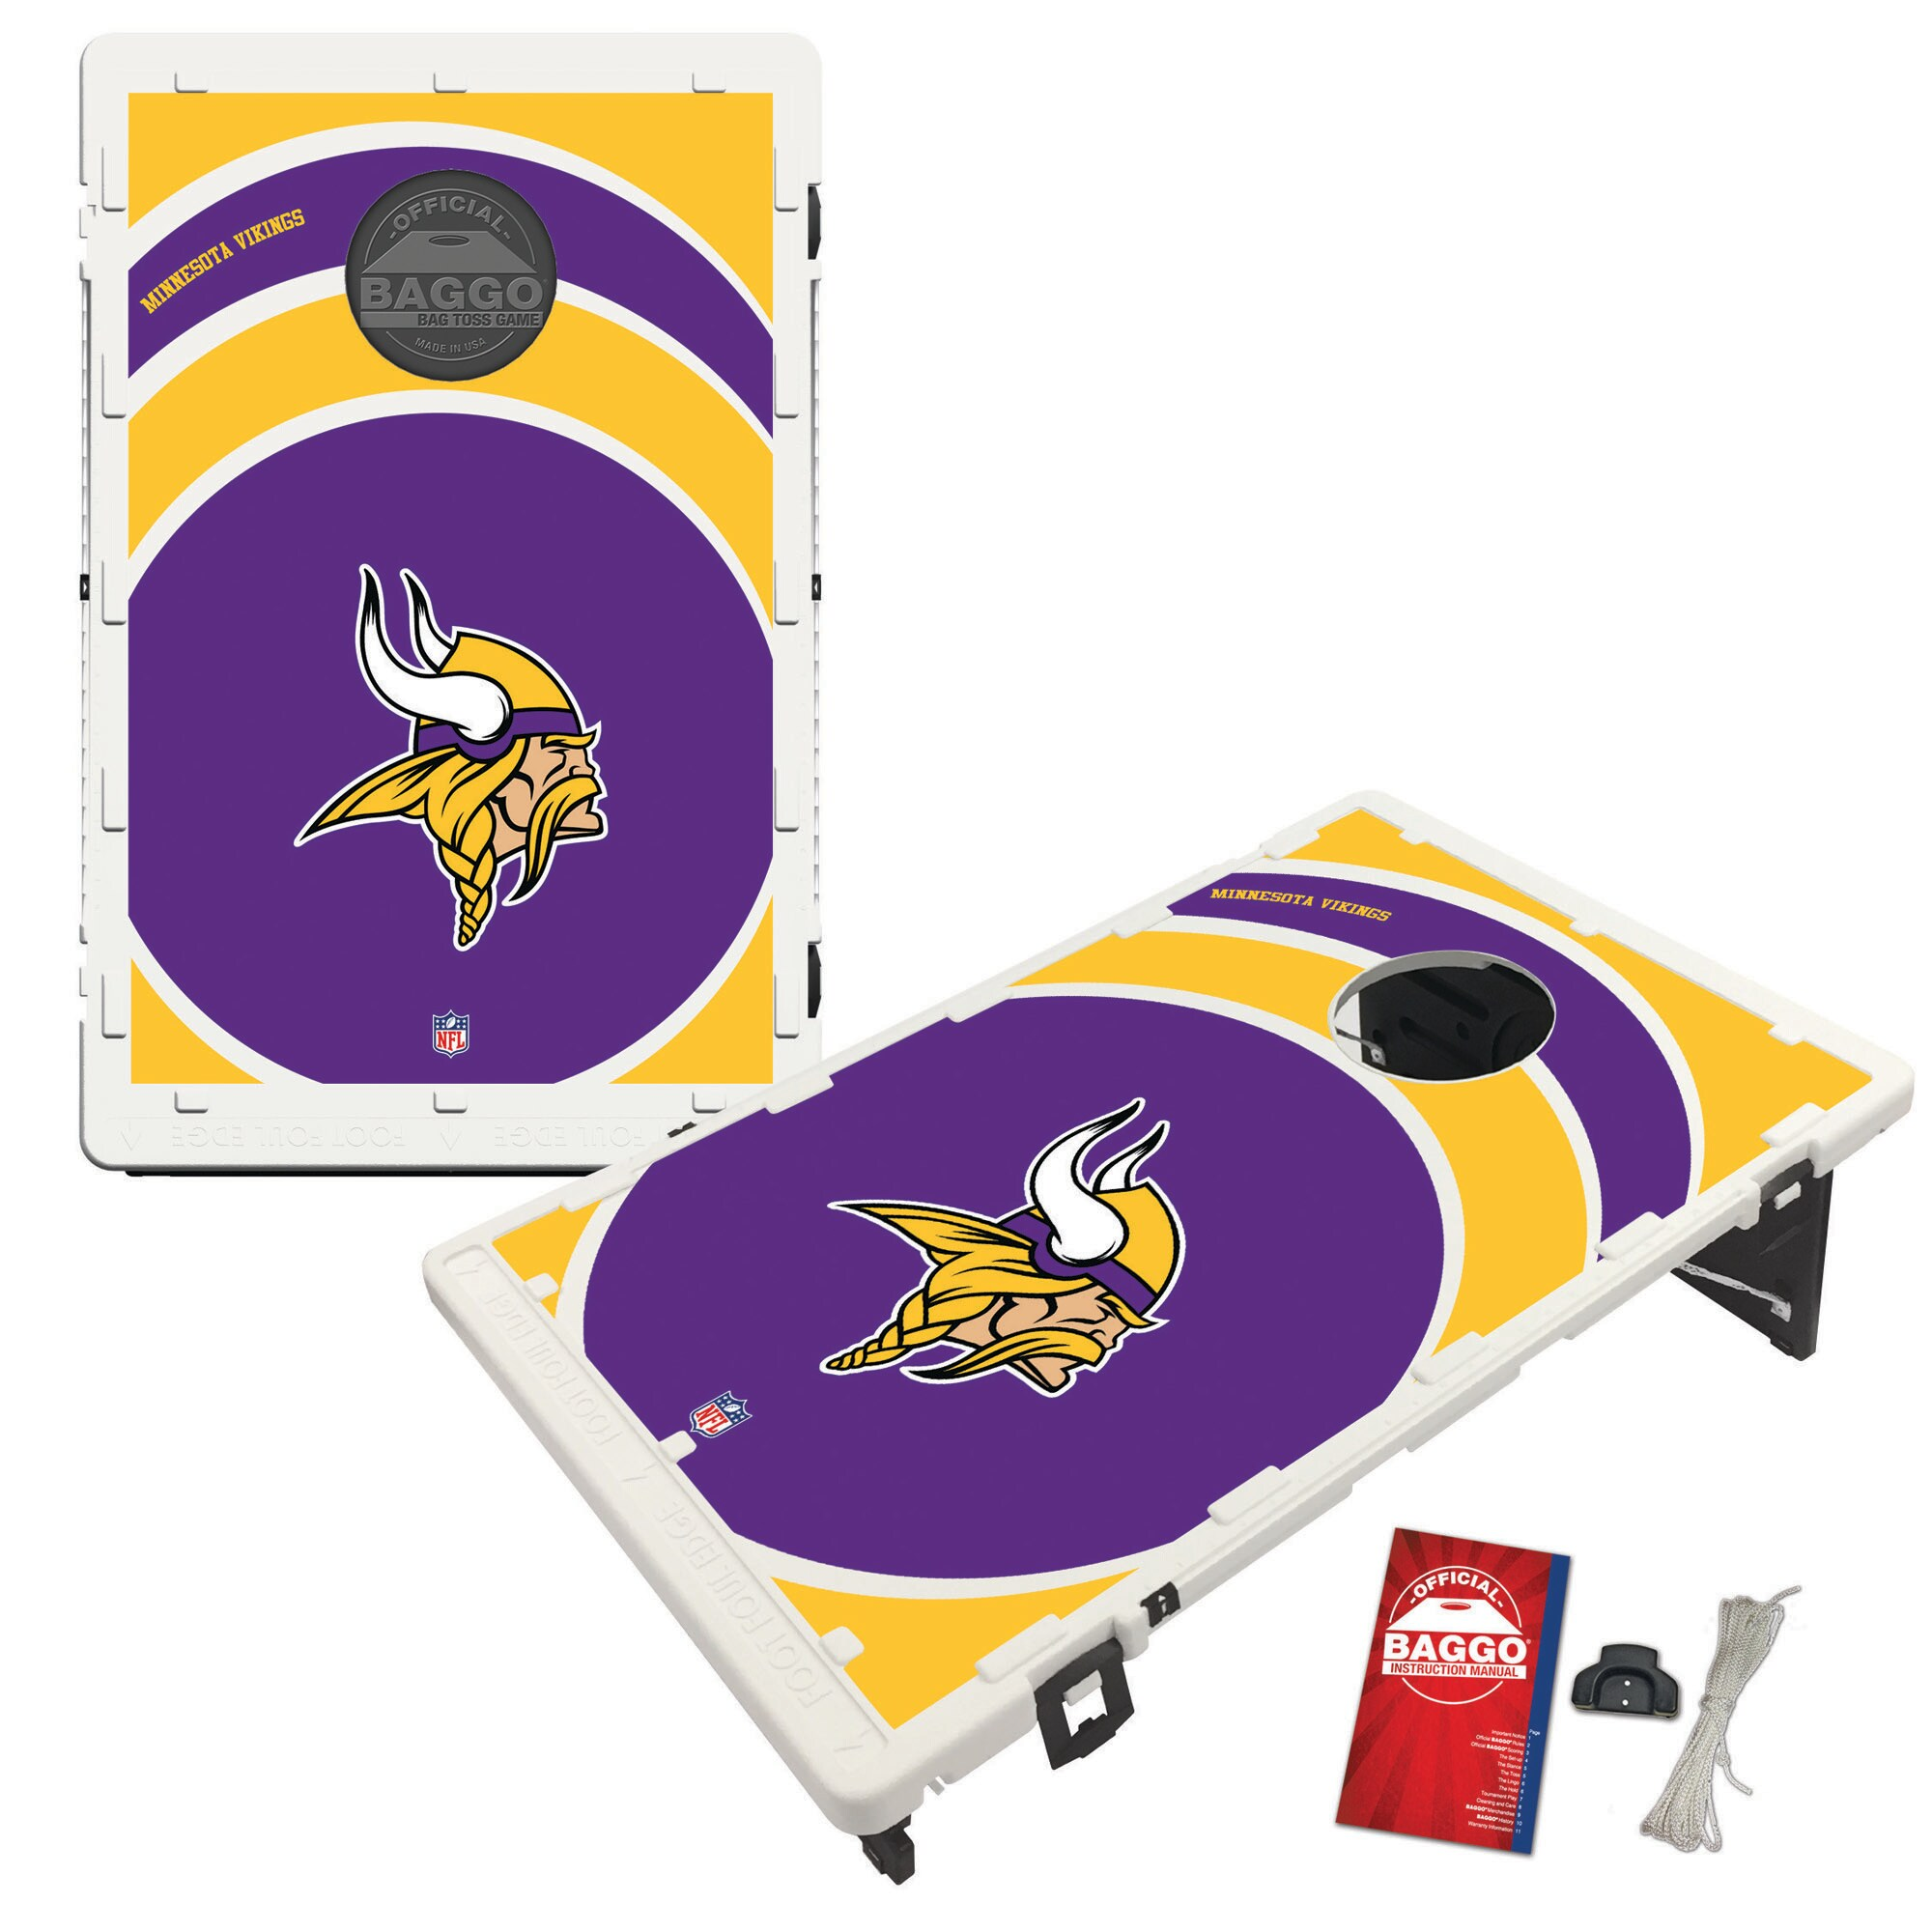 Minnesota Vikings 2' x 3' BAGGO Vortex Cornhole Board Tailgate Toss Set